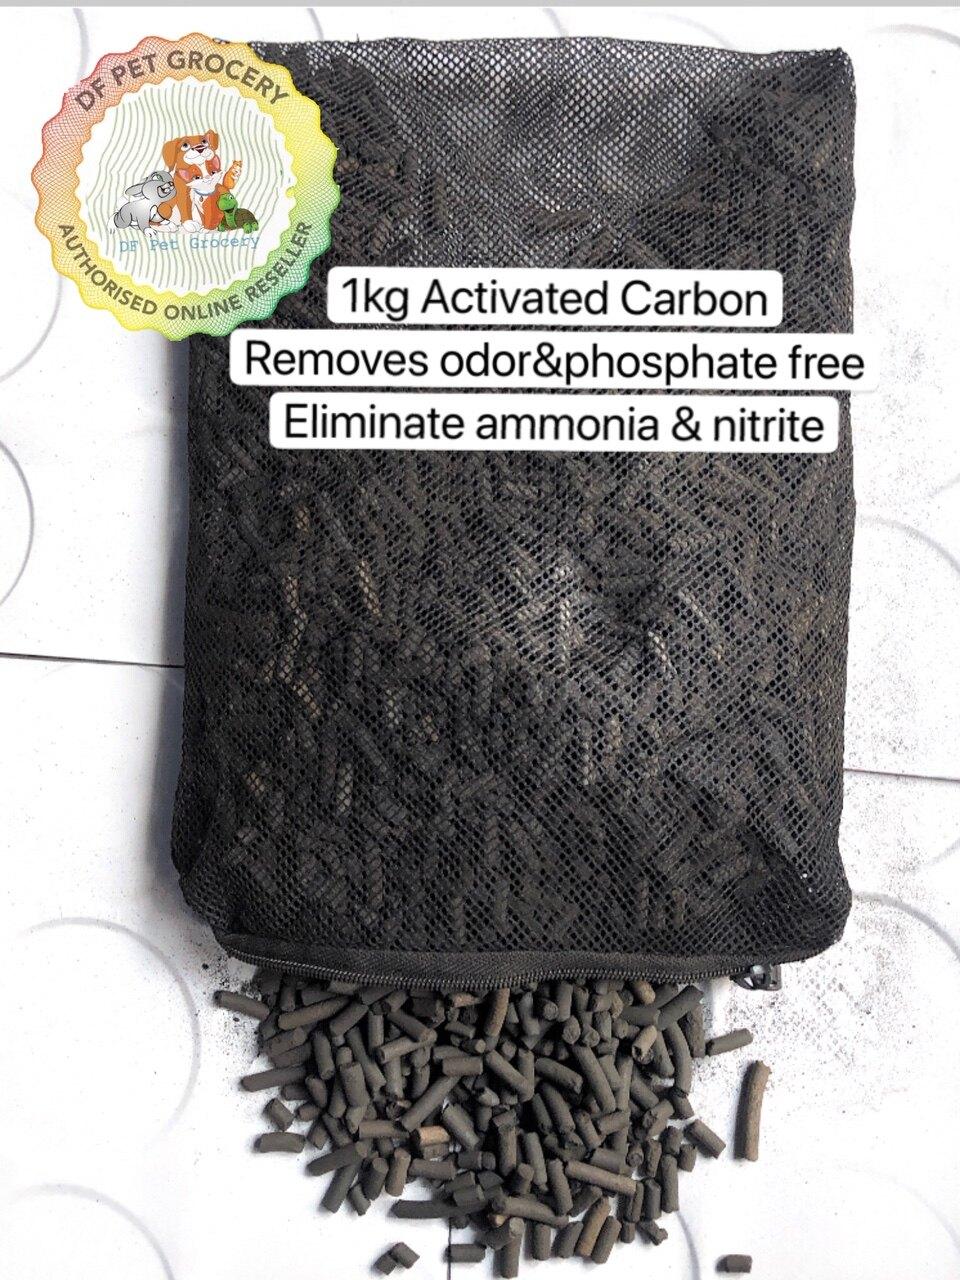 Aquarium Filter Activated Carbon 1kg / Fish Pond Filter Carbon With Net